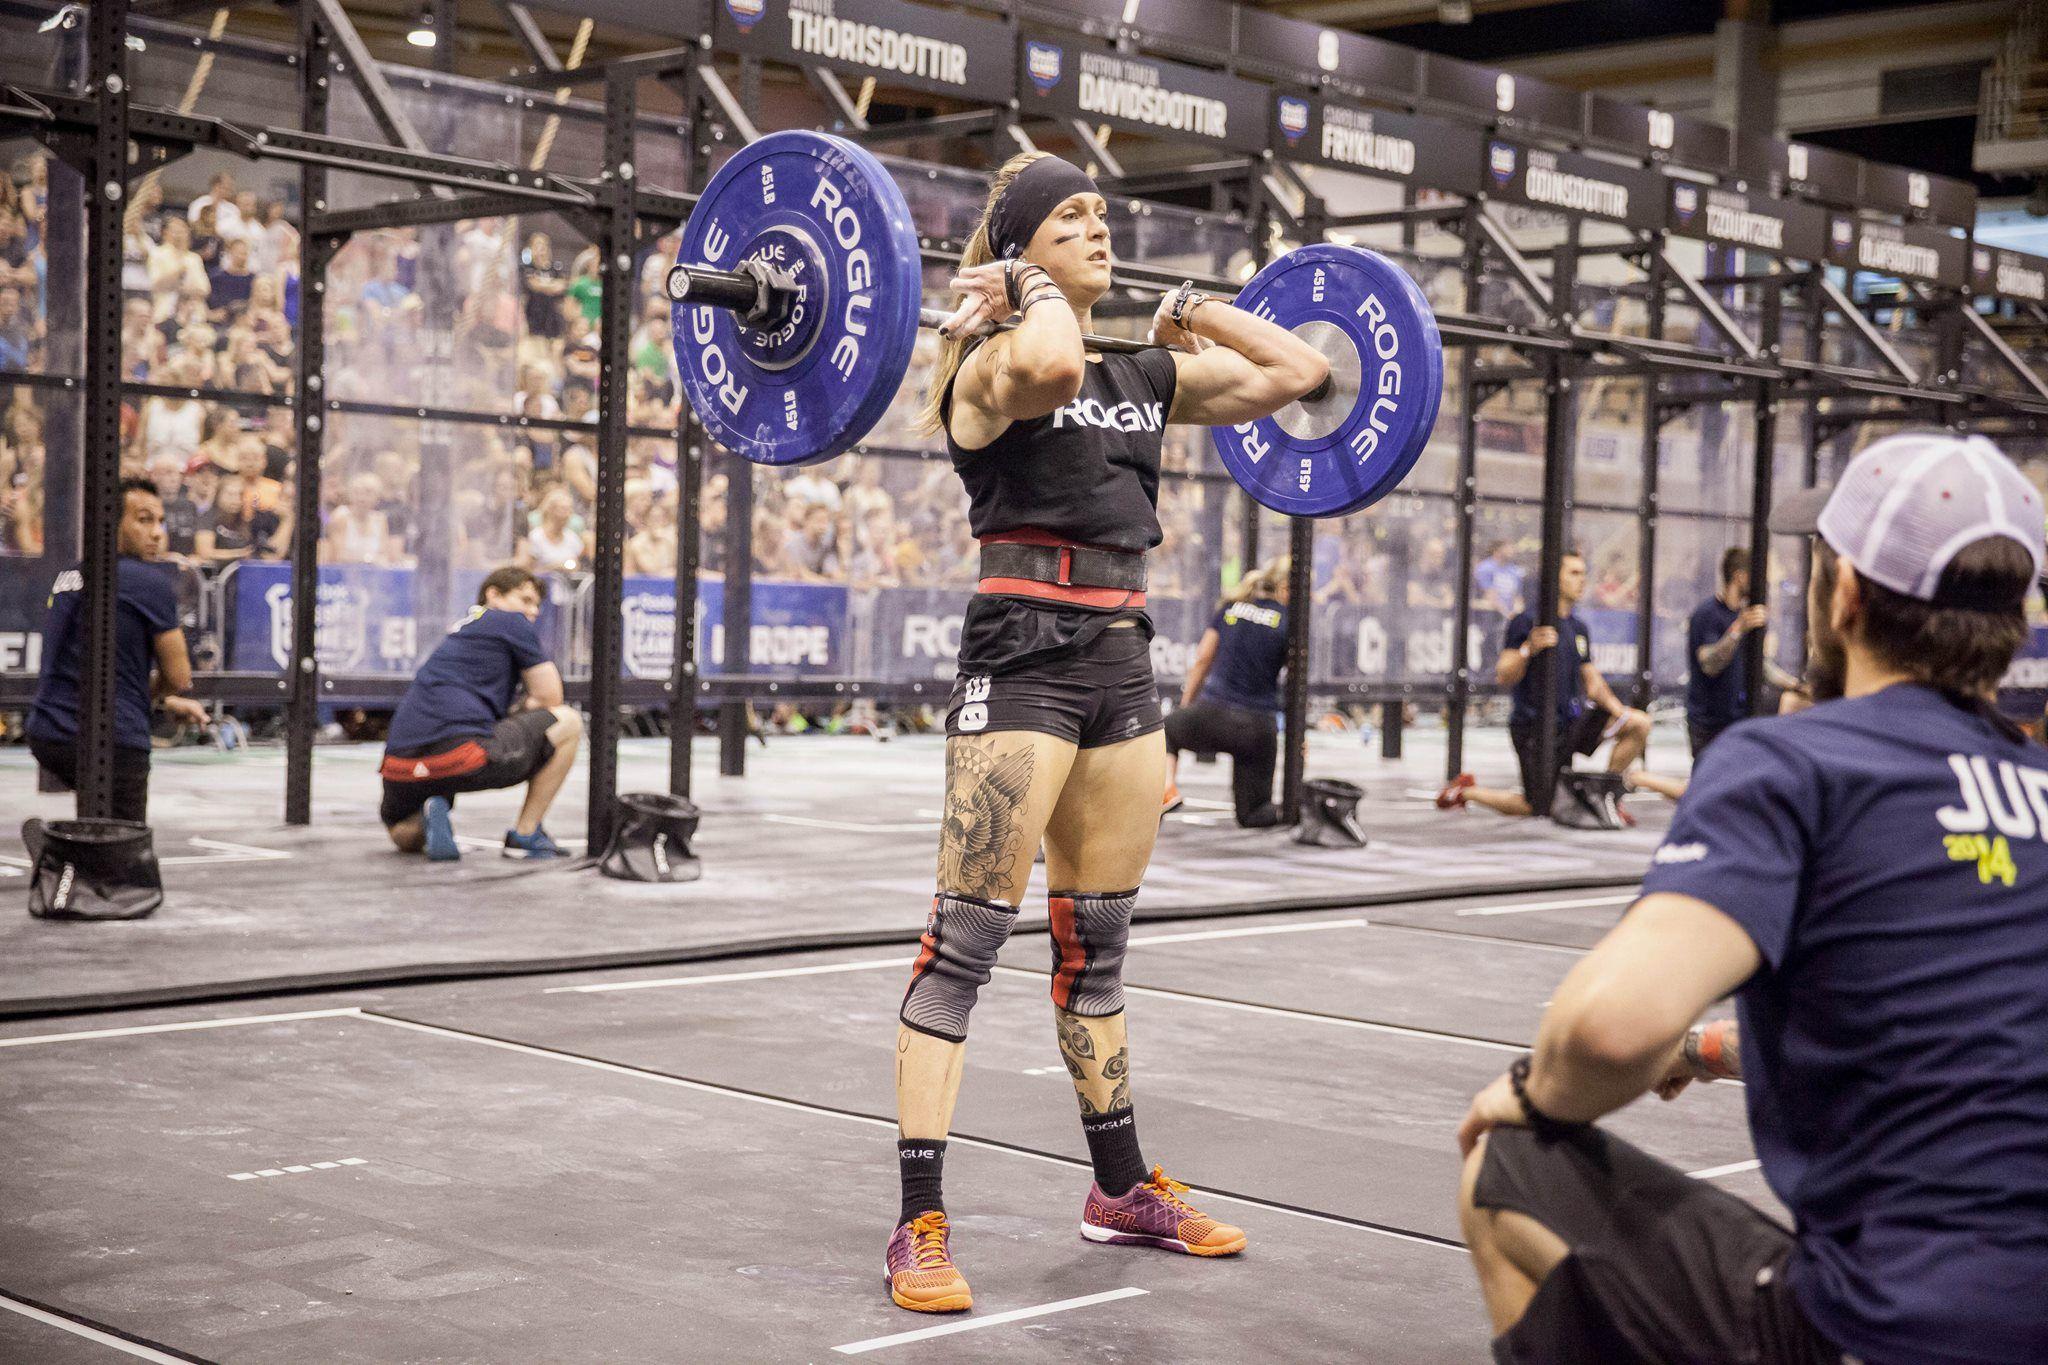 Samantha Briggs European Regional 2014 . CrossFit